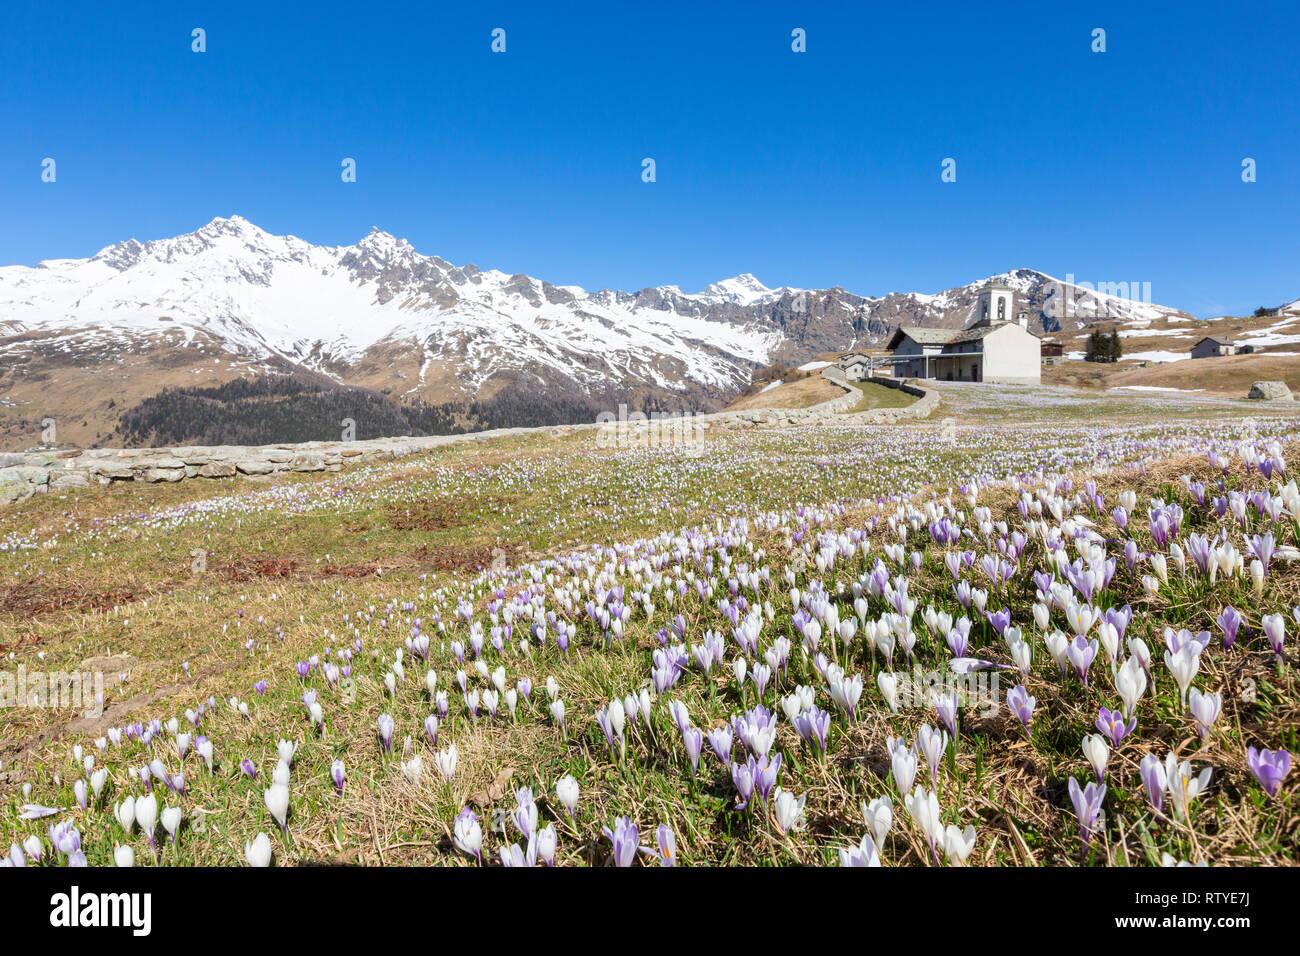 Crocus flower in bloom, Andossi, Madesimo, Chiavenna Valley, Sondrio province, Valtellina, Lombardy, Italy - Stock Image